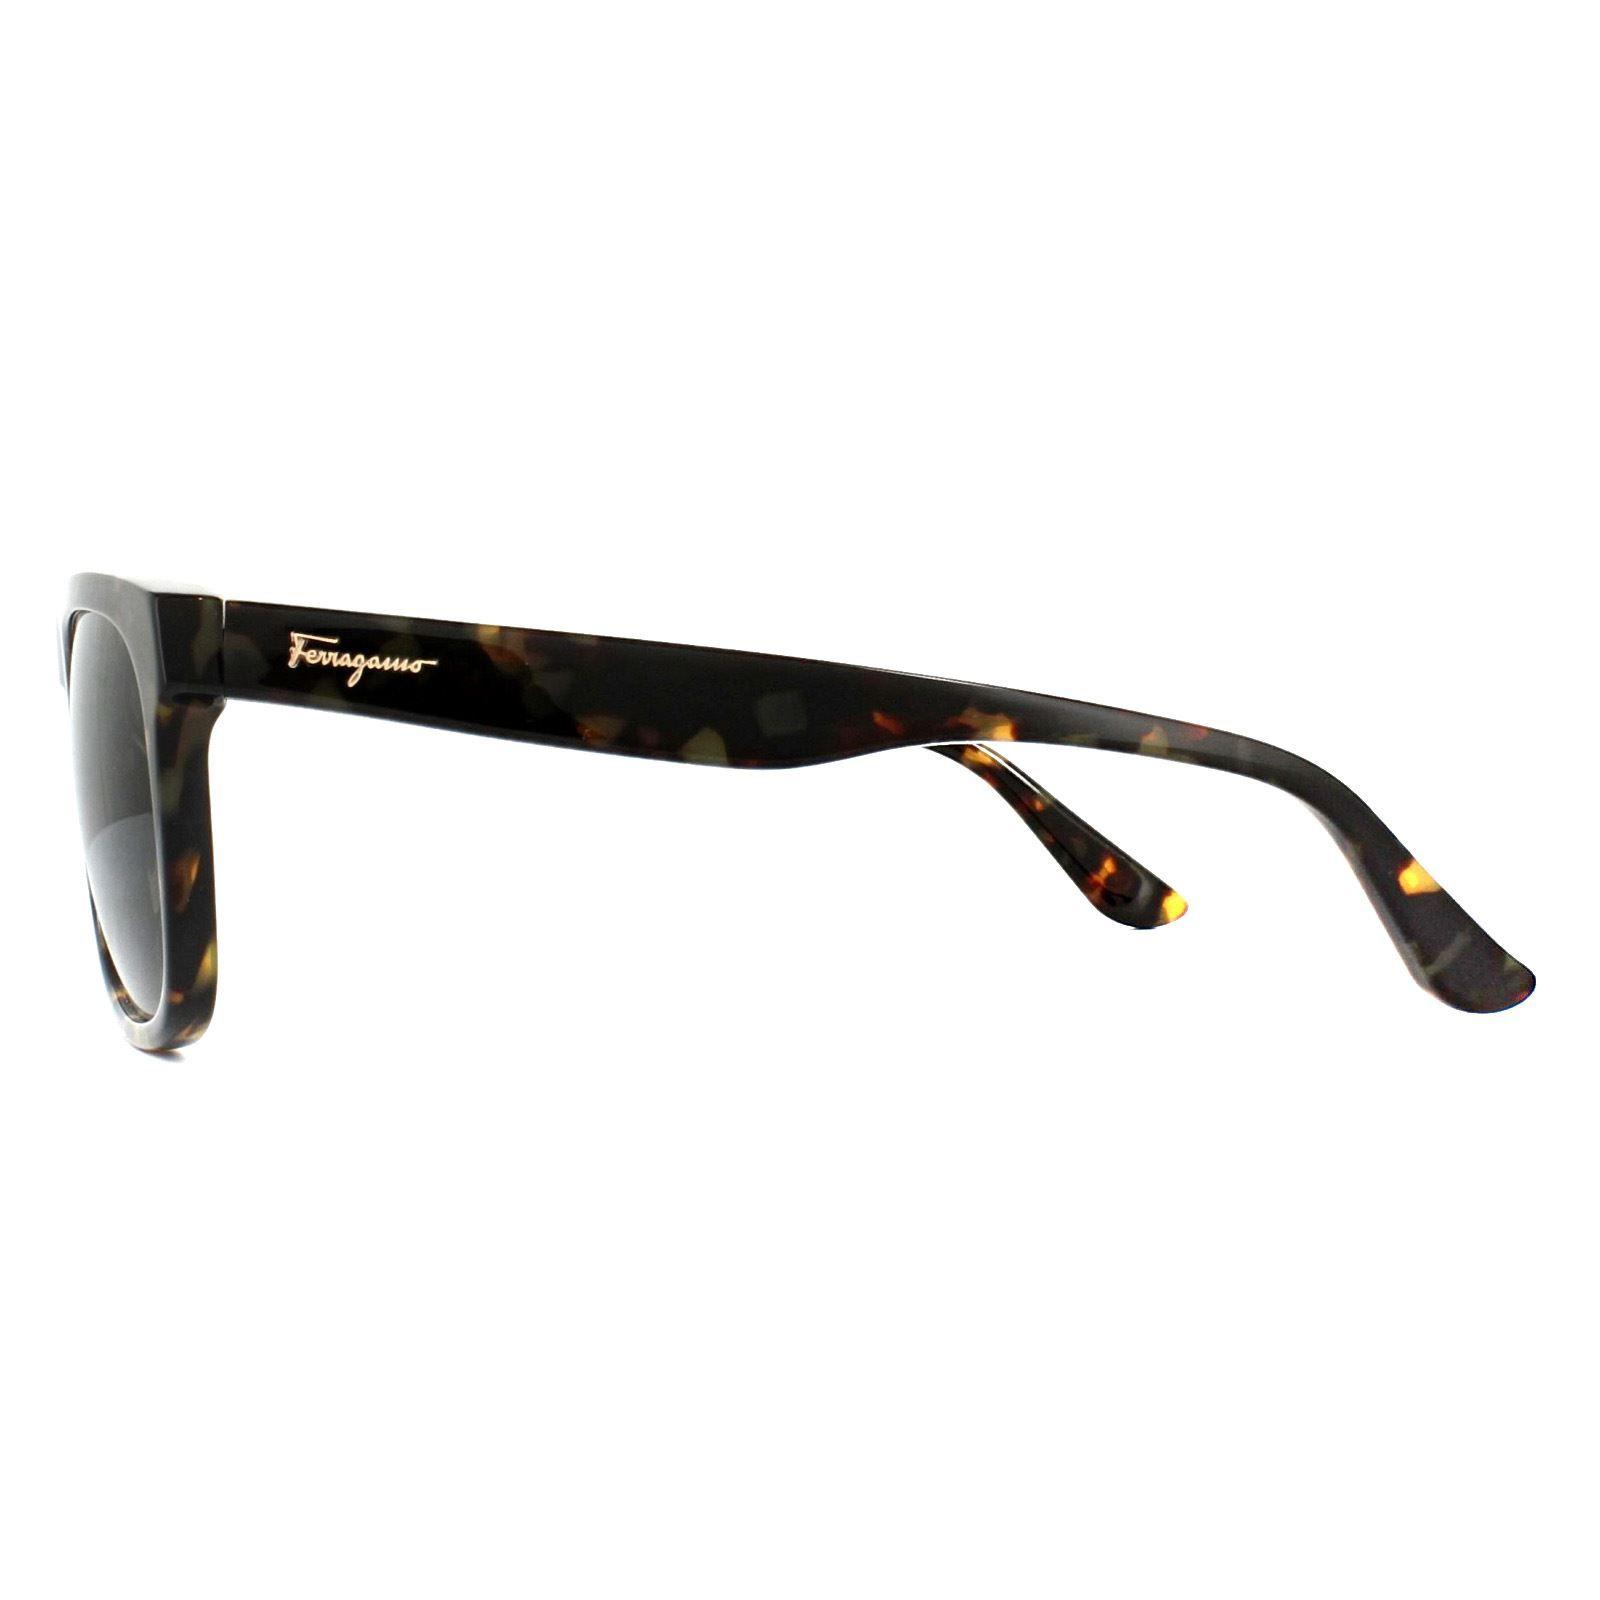 Salvatore Ferragamo Sunglasses SF776S 281 Vintage Tortoise Green